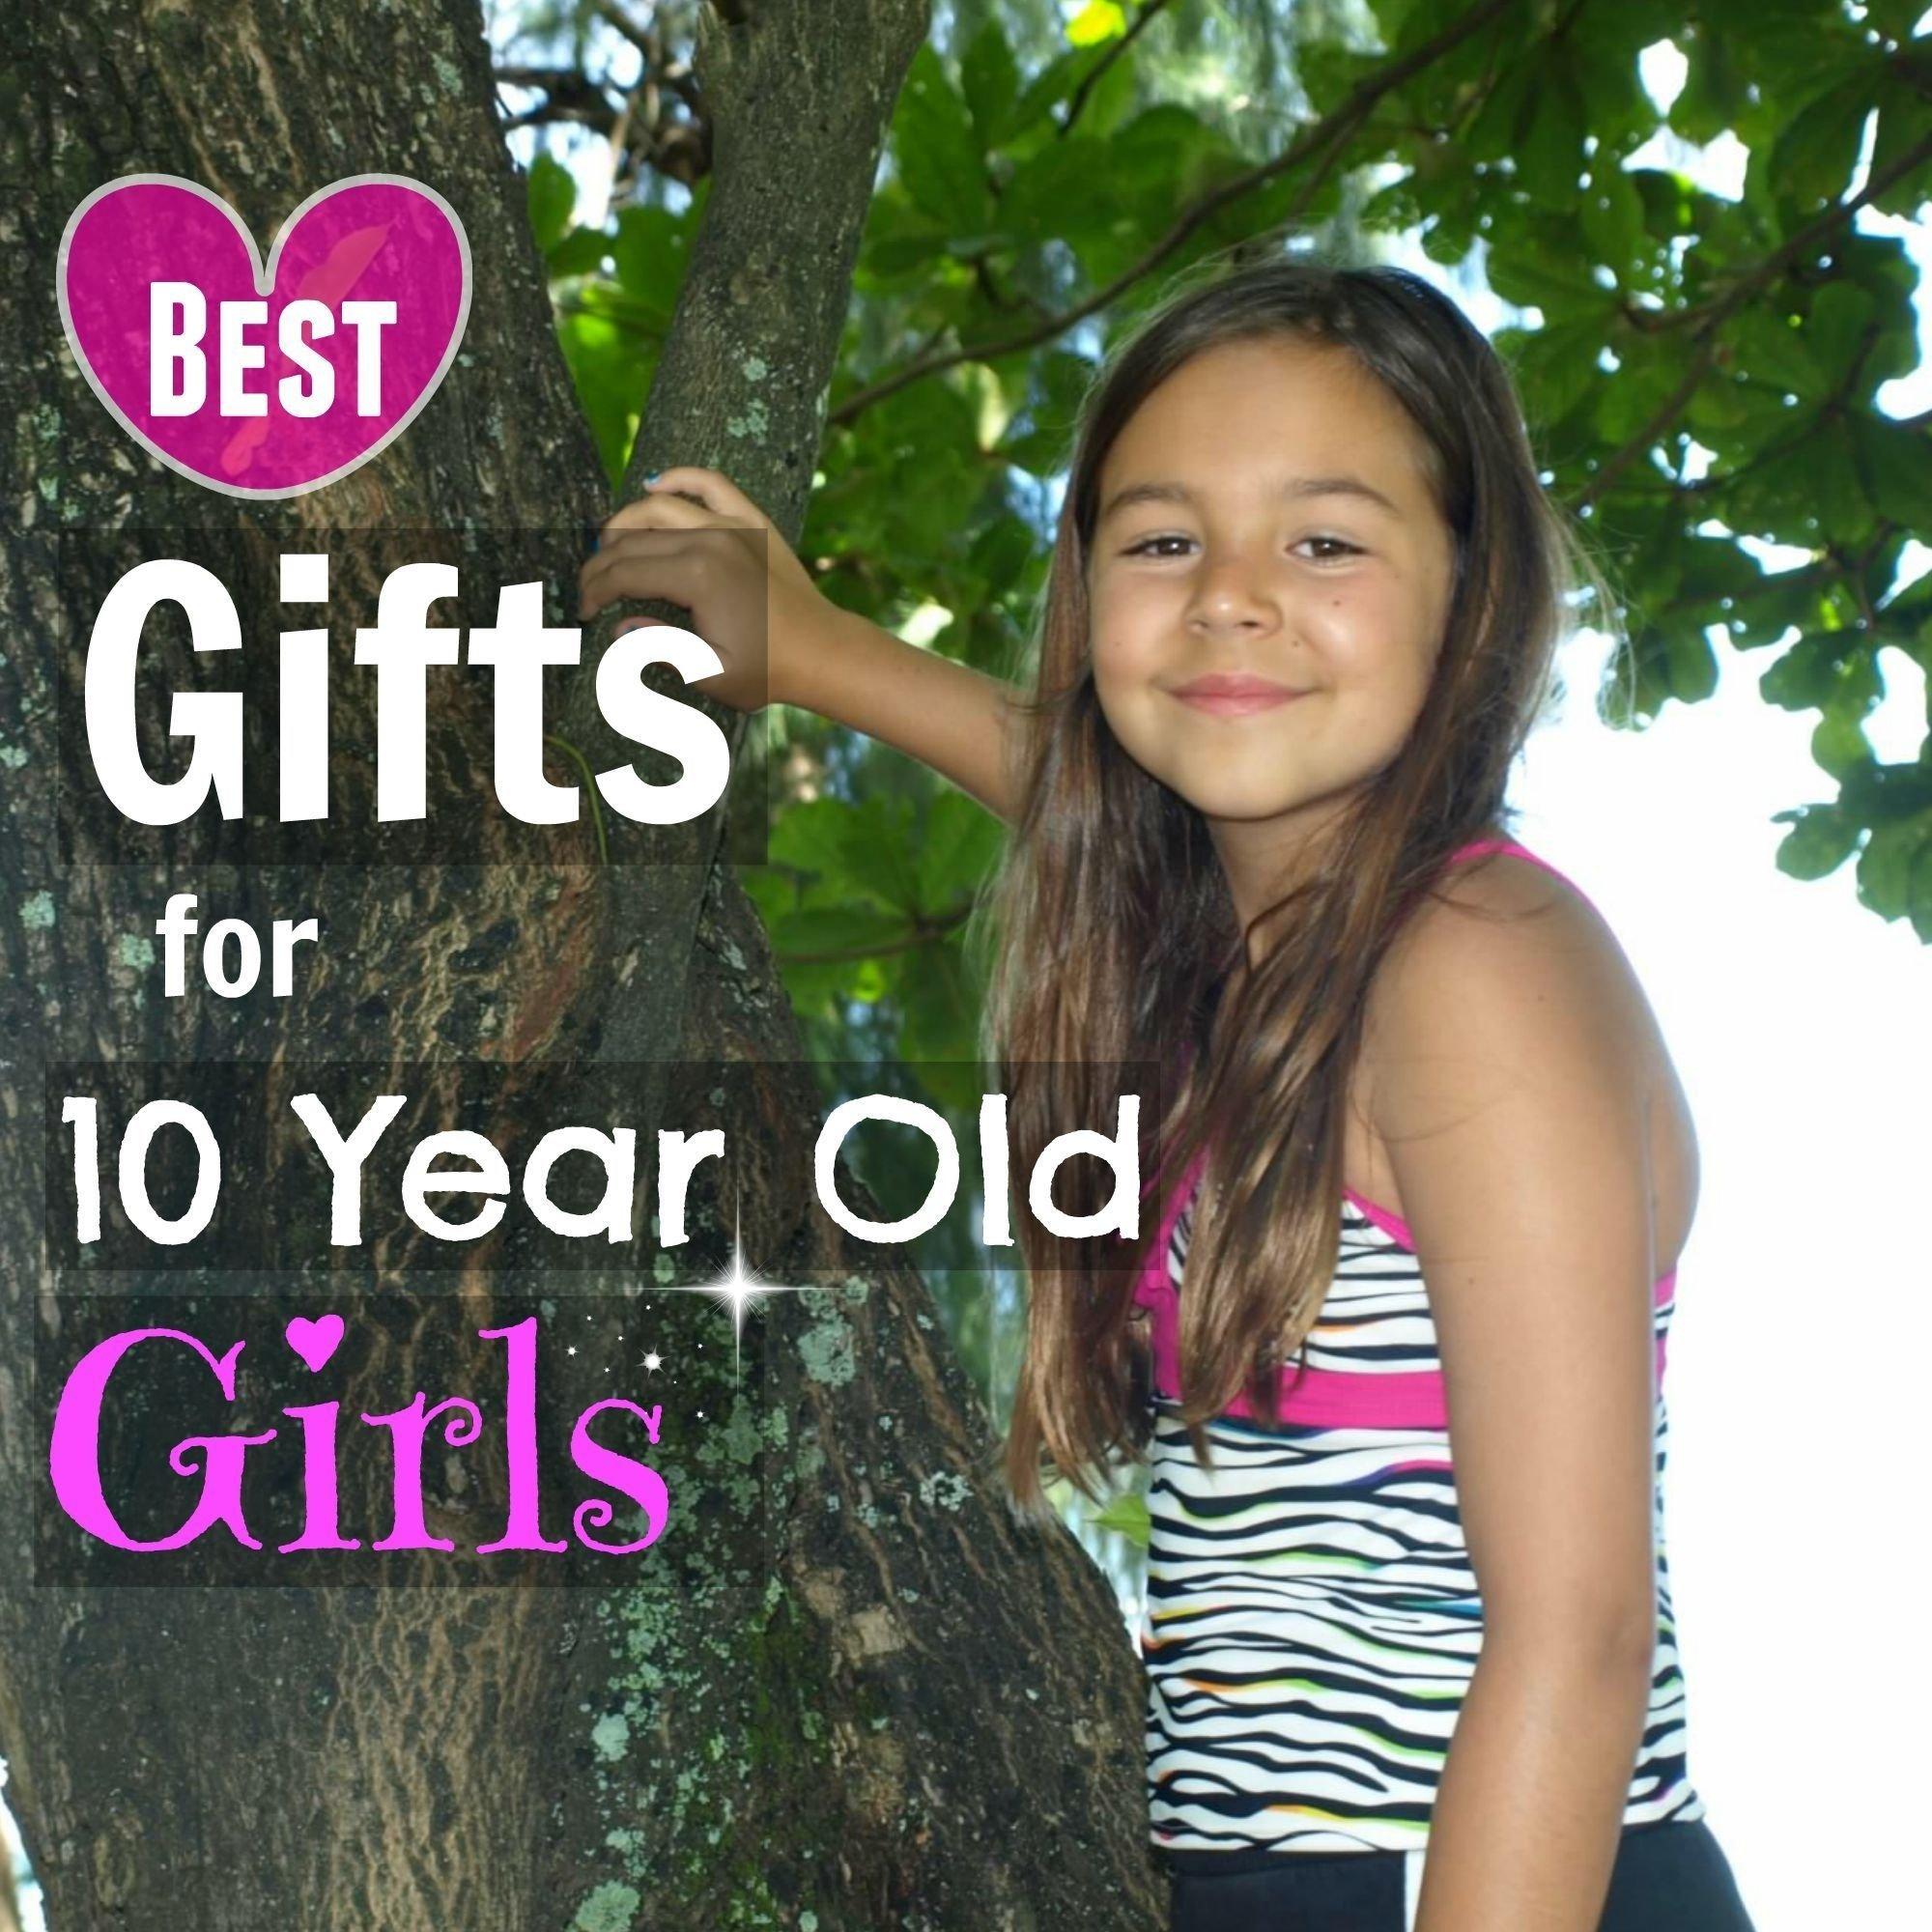 10 Cute Birthday Gift Ideas For 10 Yr Old Girl best christmas toys for 10 year old girls 2017 10 years christmas 2020